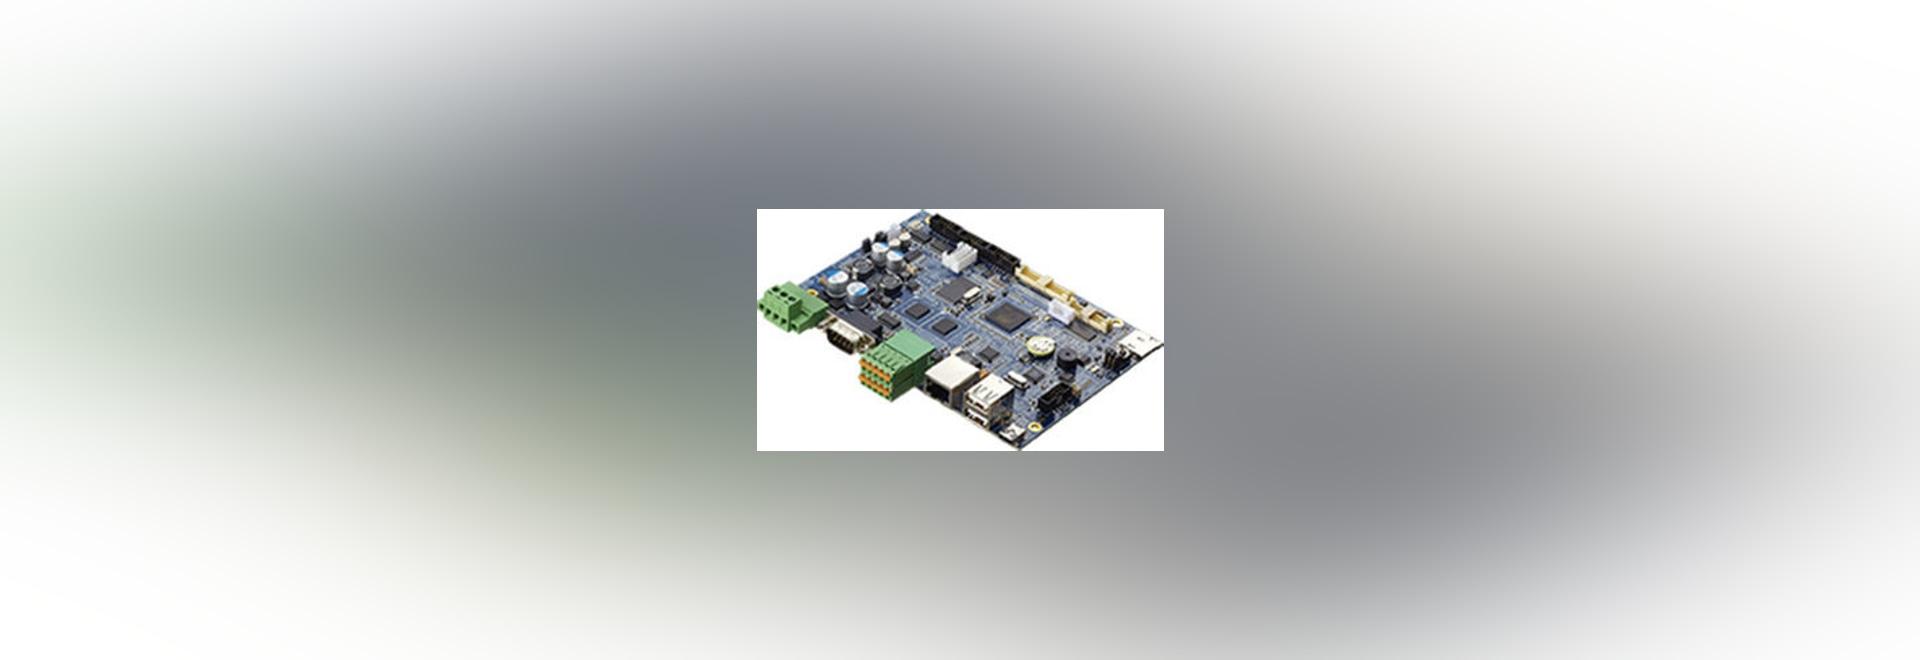 NEW: ATMEL AT91SAM9G45 single-board computer by Artila Electronics ...